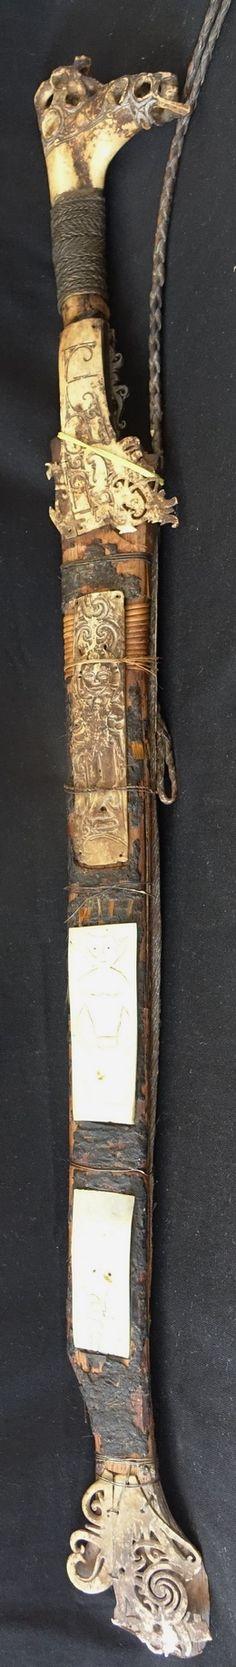 Rare genuine Dayak Headhunters Sword Sarawak Borneo - Antique more than 100 years old